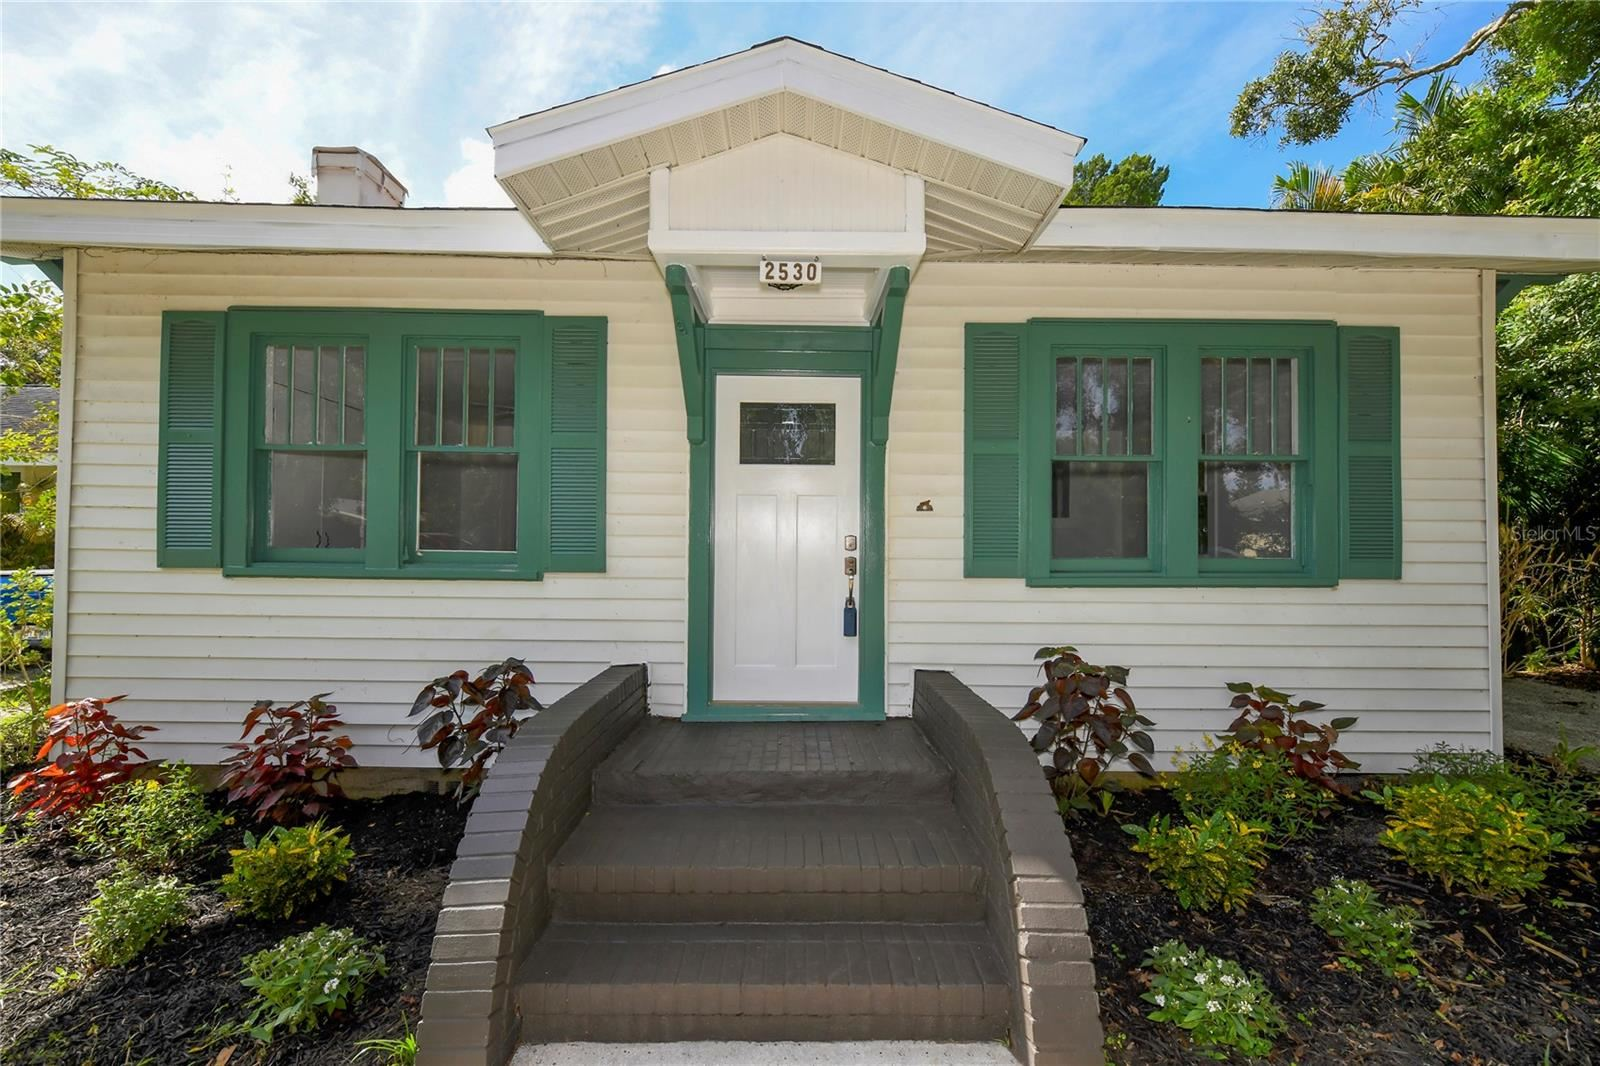 2530 LOMA LINDA STREET, Sarasota, FL 34239 - #: A4498965